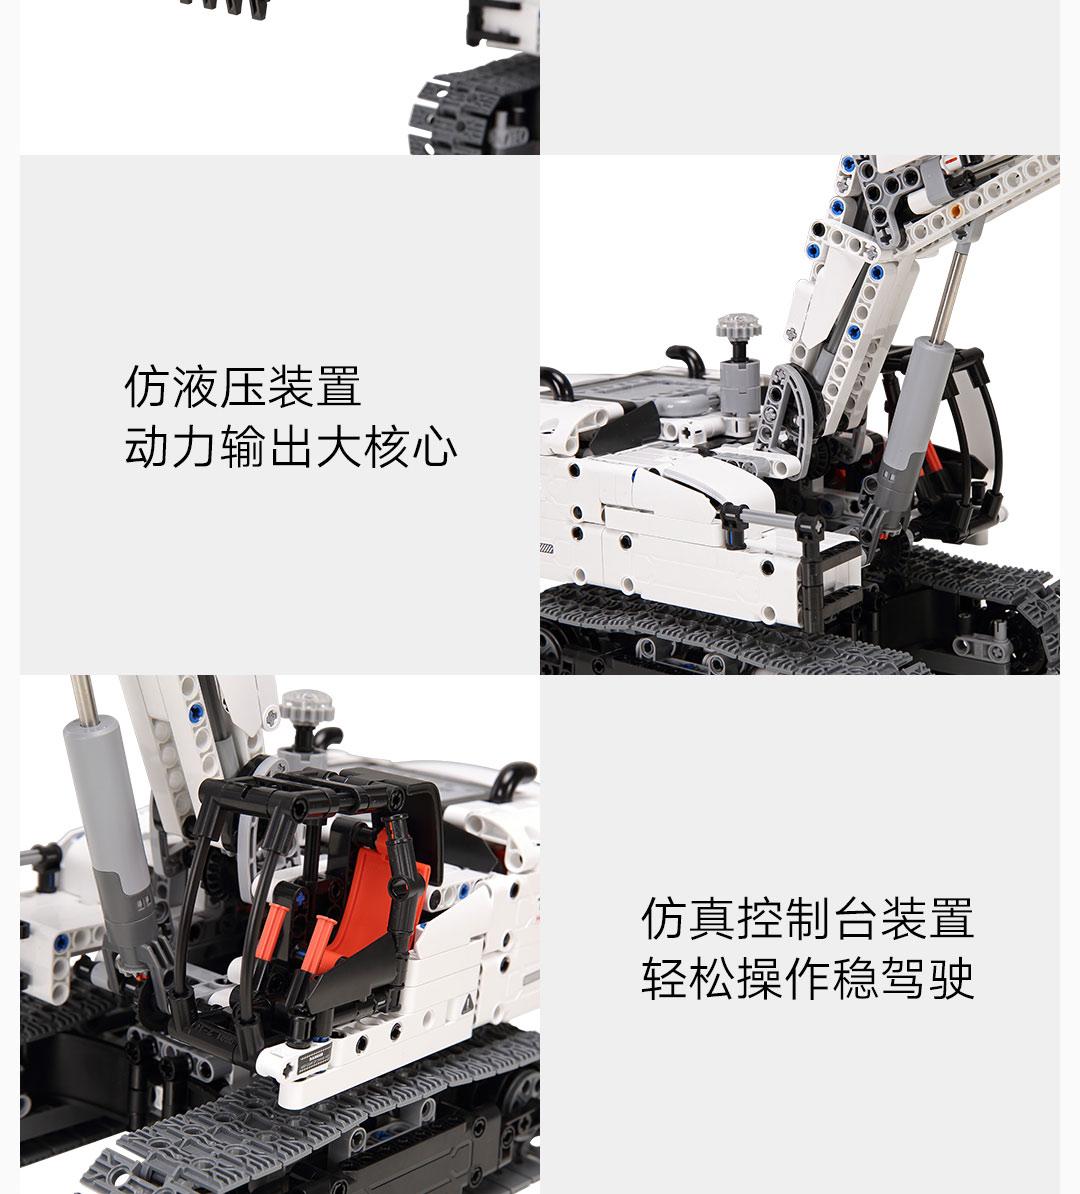 product_奇妙_小米工程挖掘机